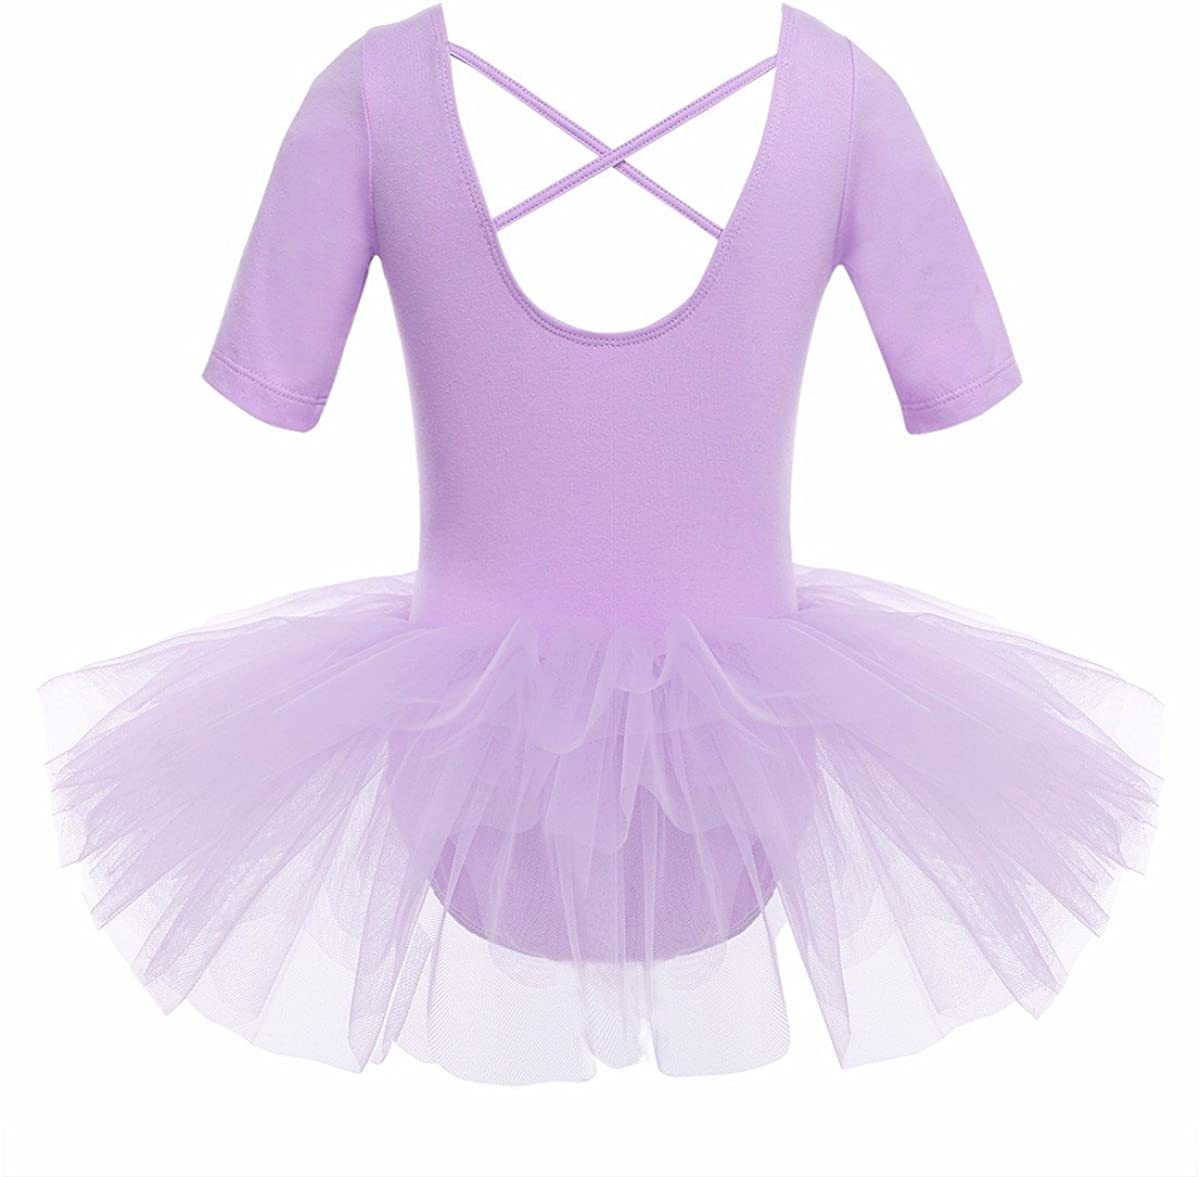 iiniim Girls Short Sleeve Tulle Ballet Dresses Dance Leotard Tutu Skirt Ballerina Dancewear Dancing Costumes